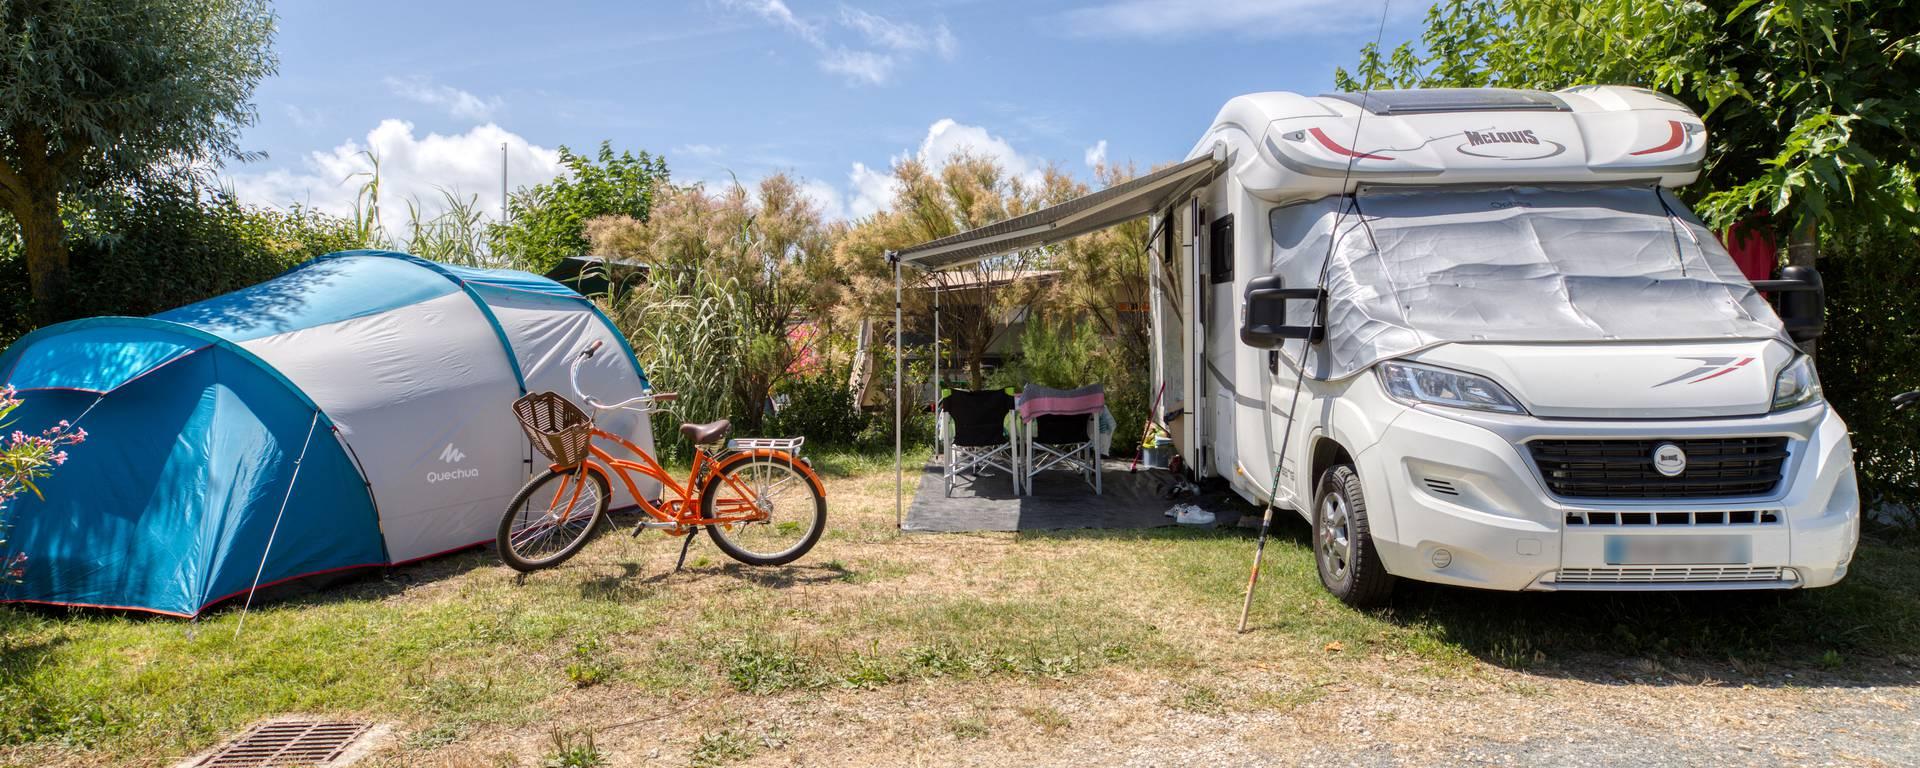 Emplacement Camping la Plage